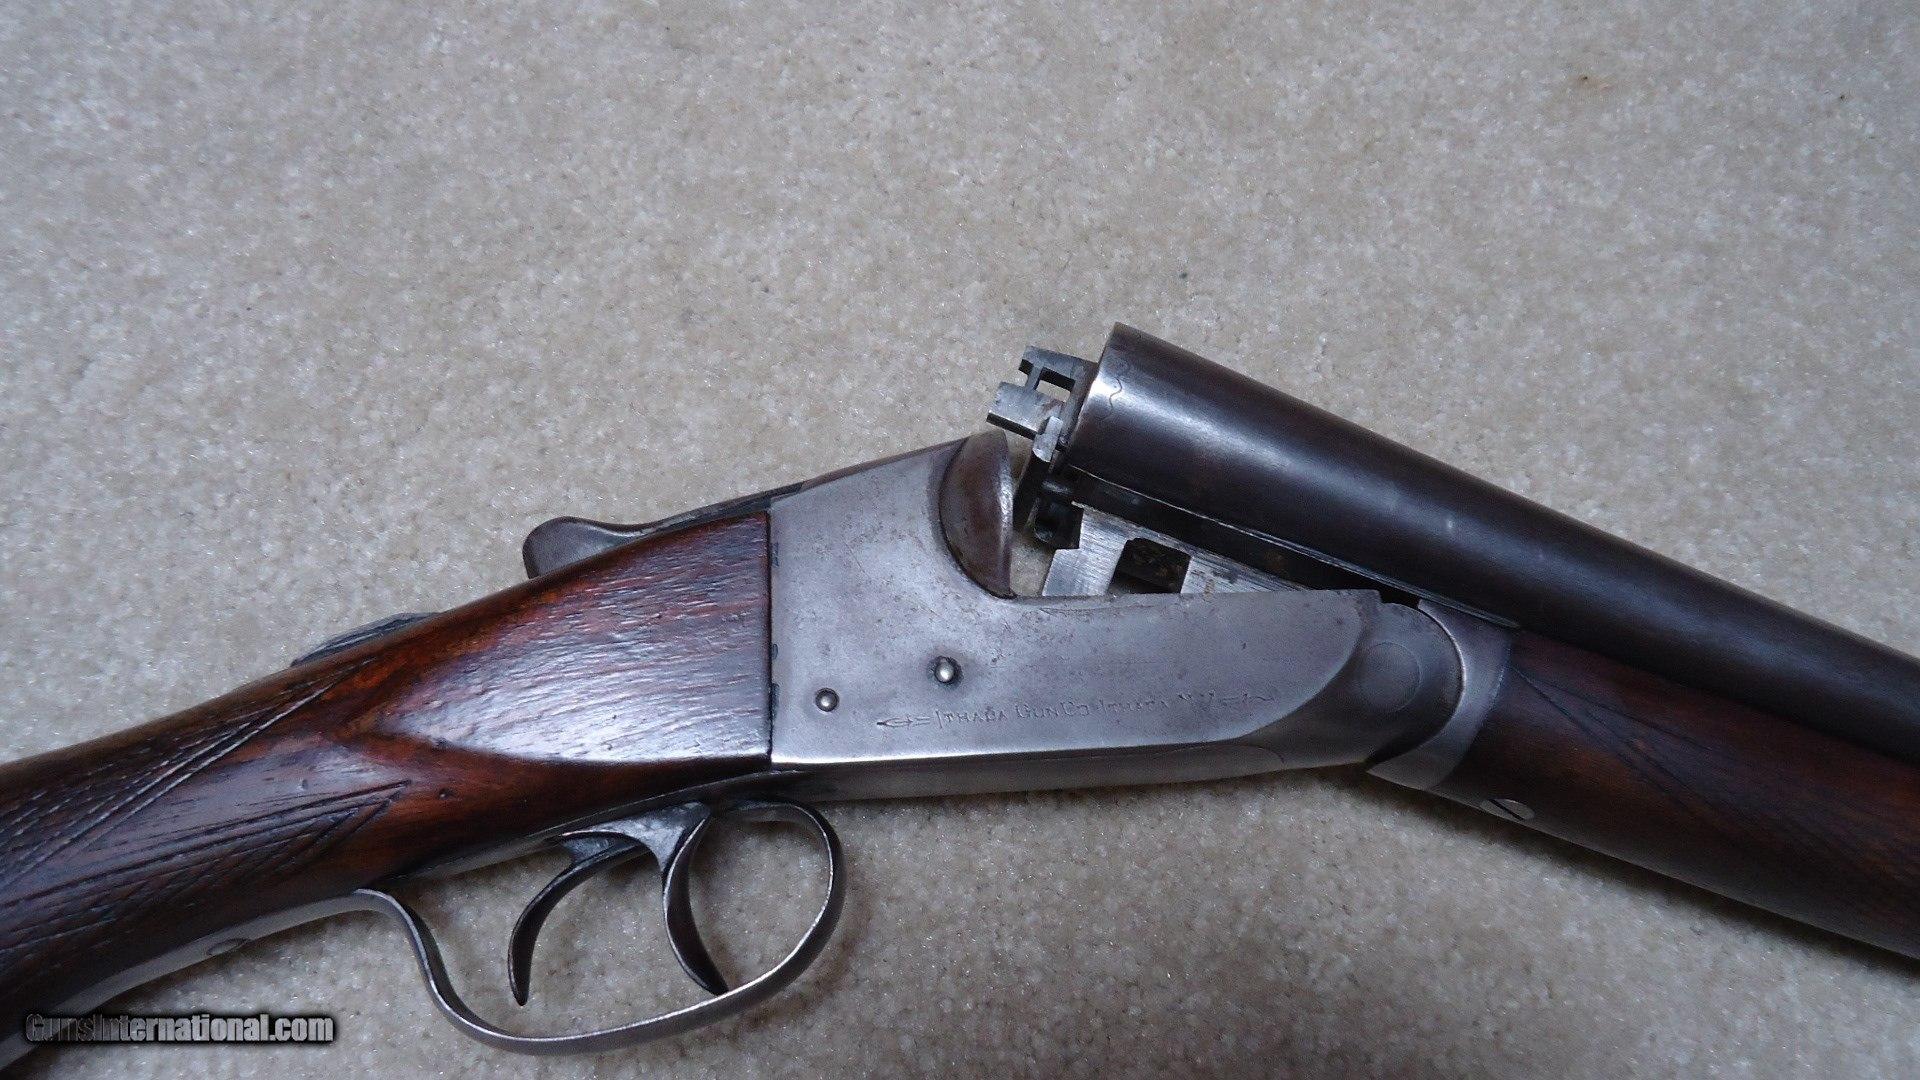 CLASSIC ITHACA DOUBLE BARREL SHOTGUN, SCARCE 16 GAUGE WITH